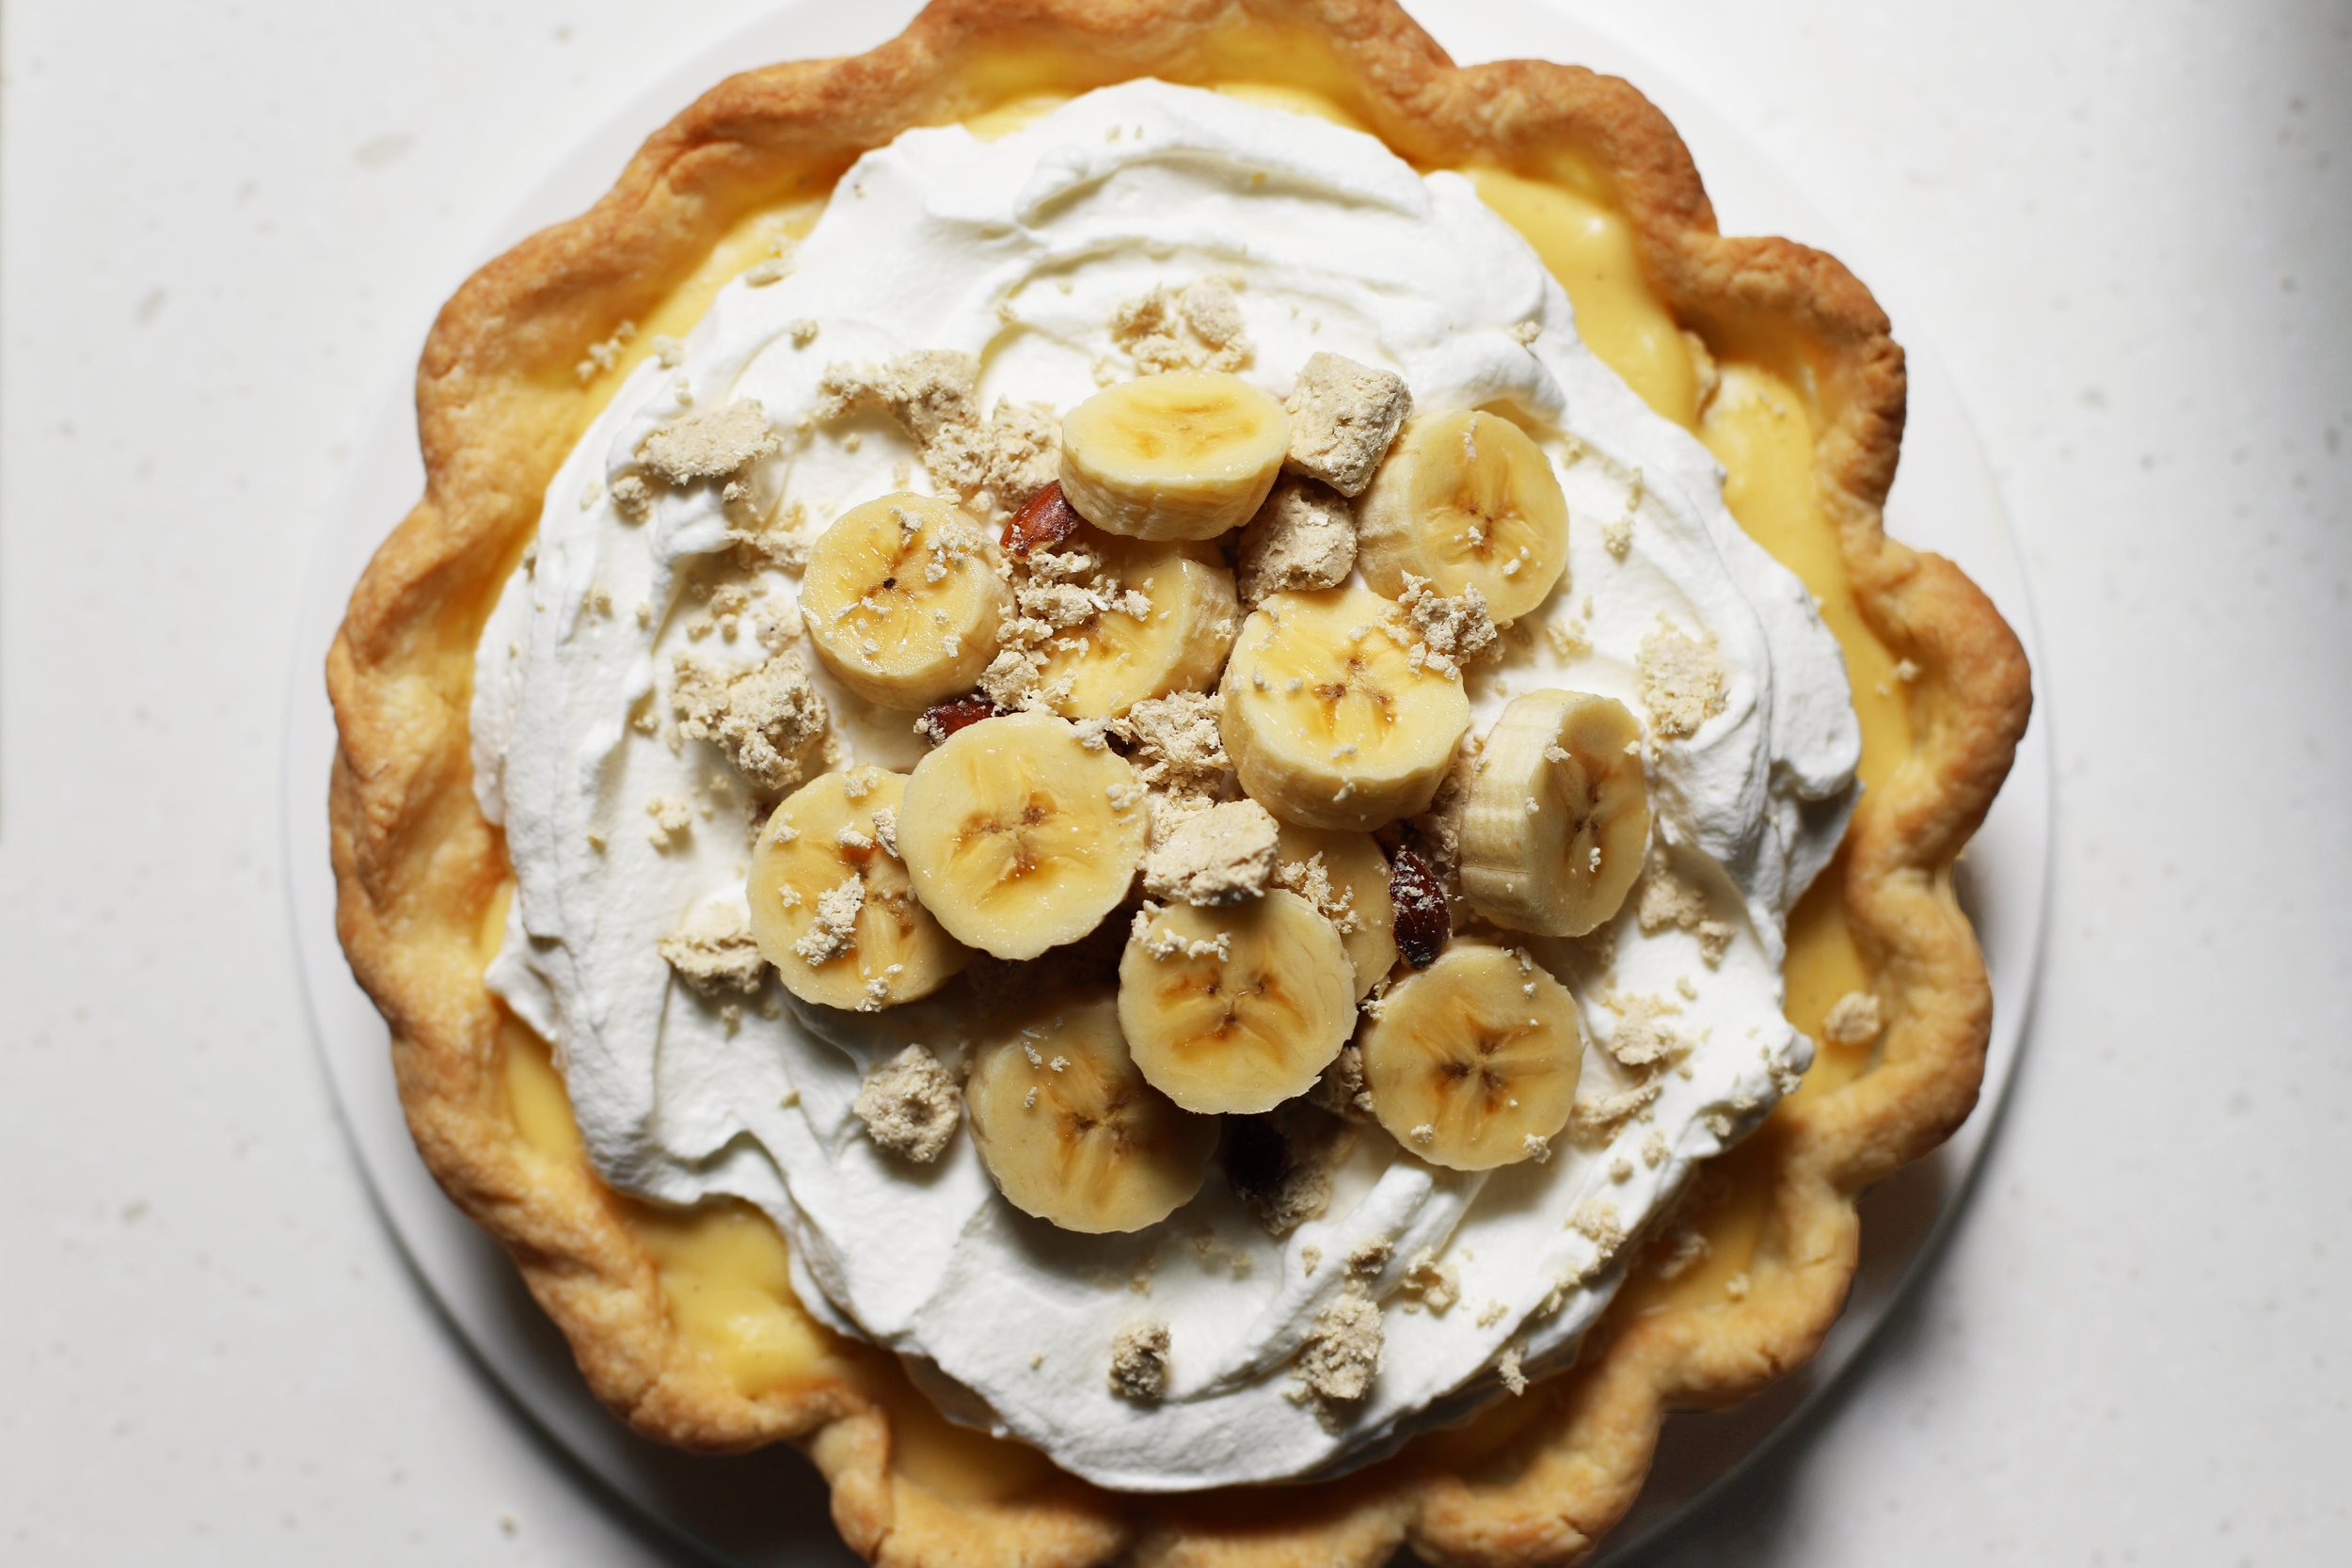 banana cream pie with halva and cardamom